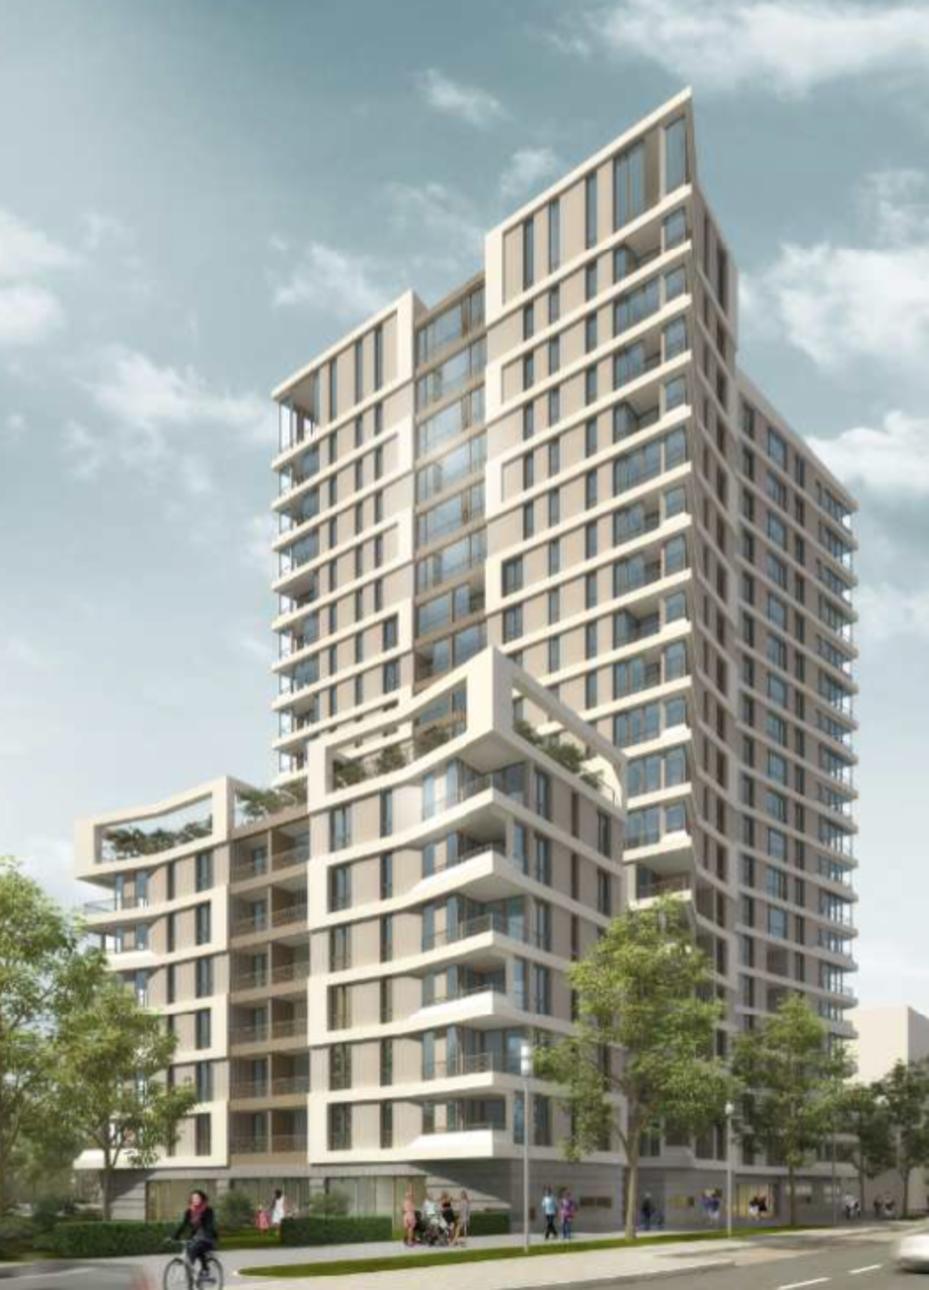 msm architekten planen westside towers in frankfurt